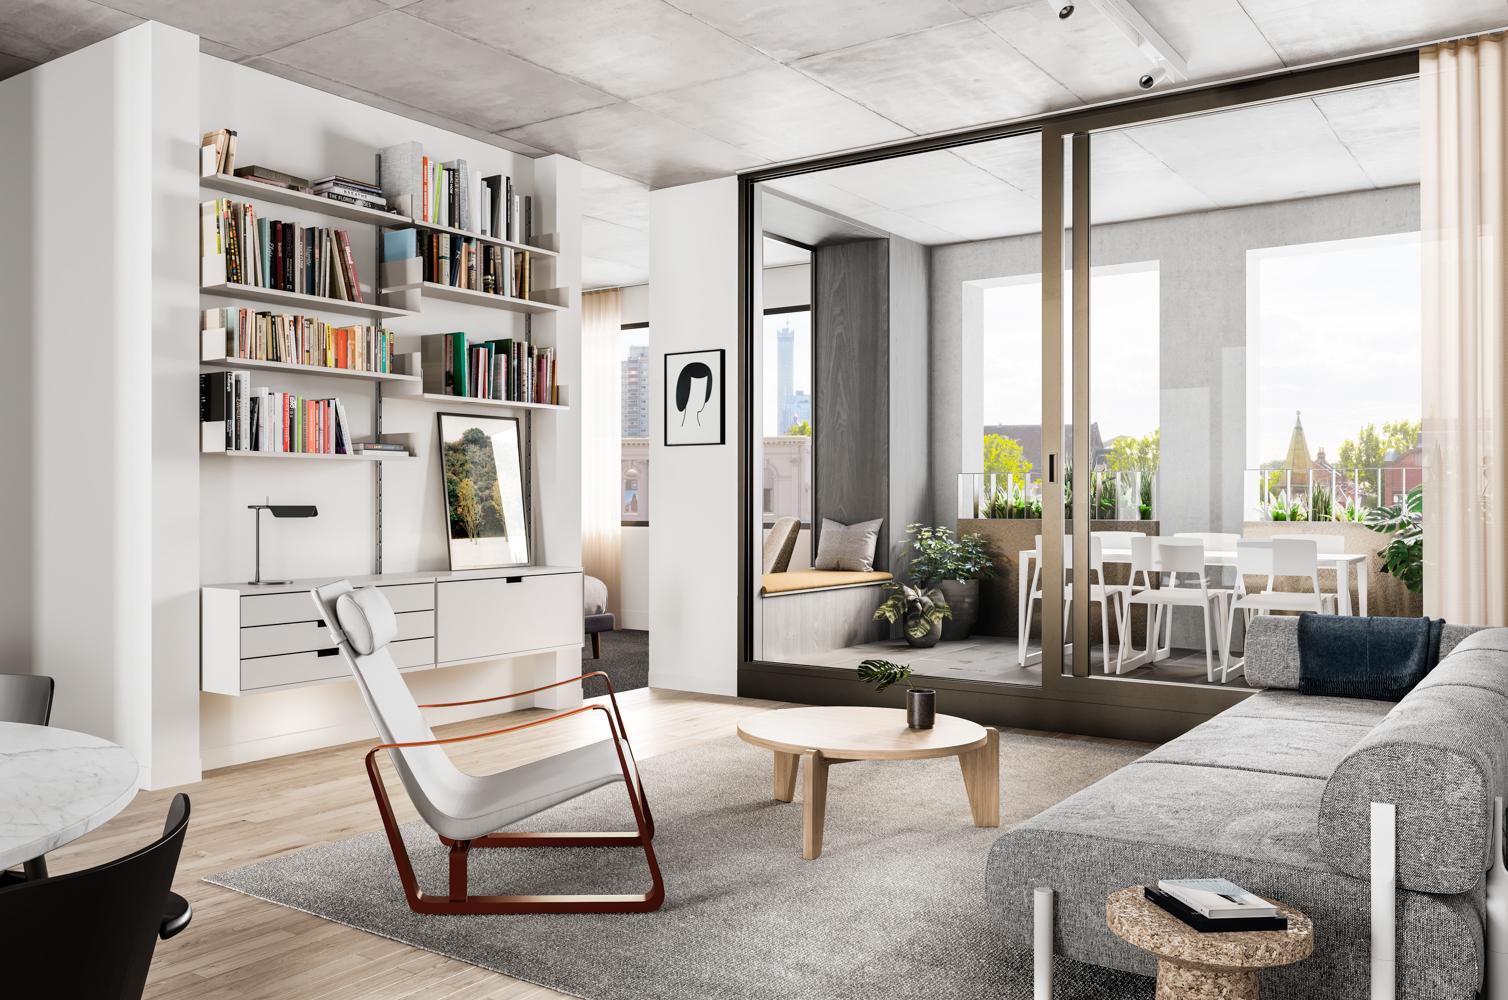 bedford-street-dko-architecture-milieu-property-the-design-emotive-03.jpg